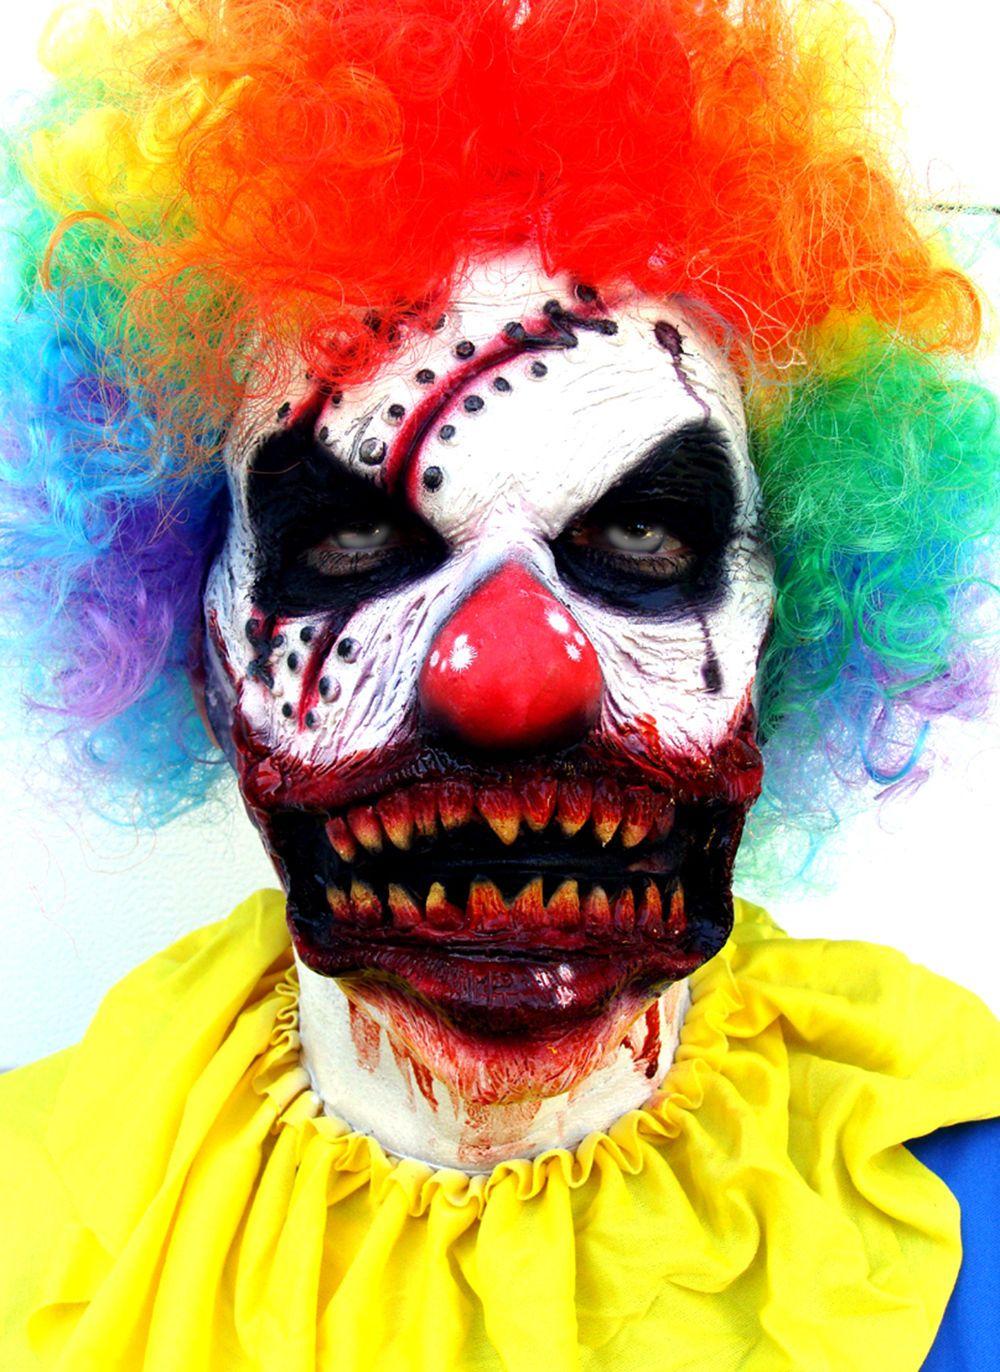 Killer Clown, Scary Clown, Scary Clown Costume, Scary Clown Mask ...